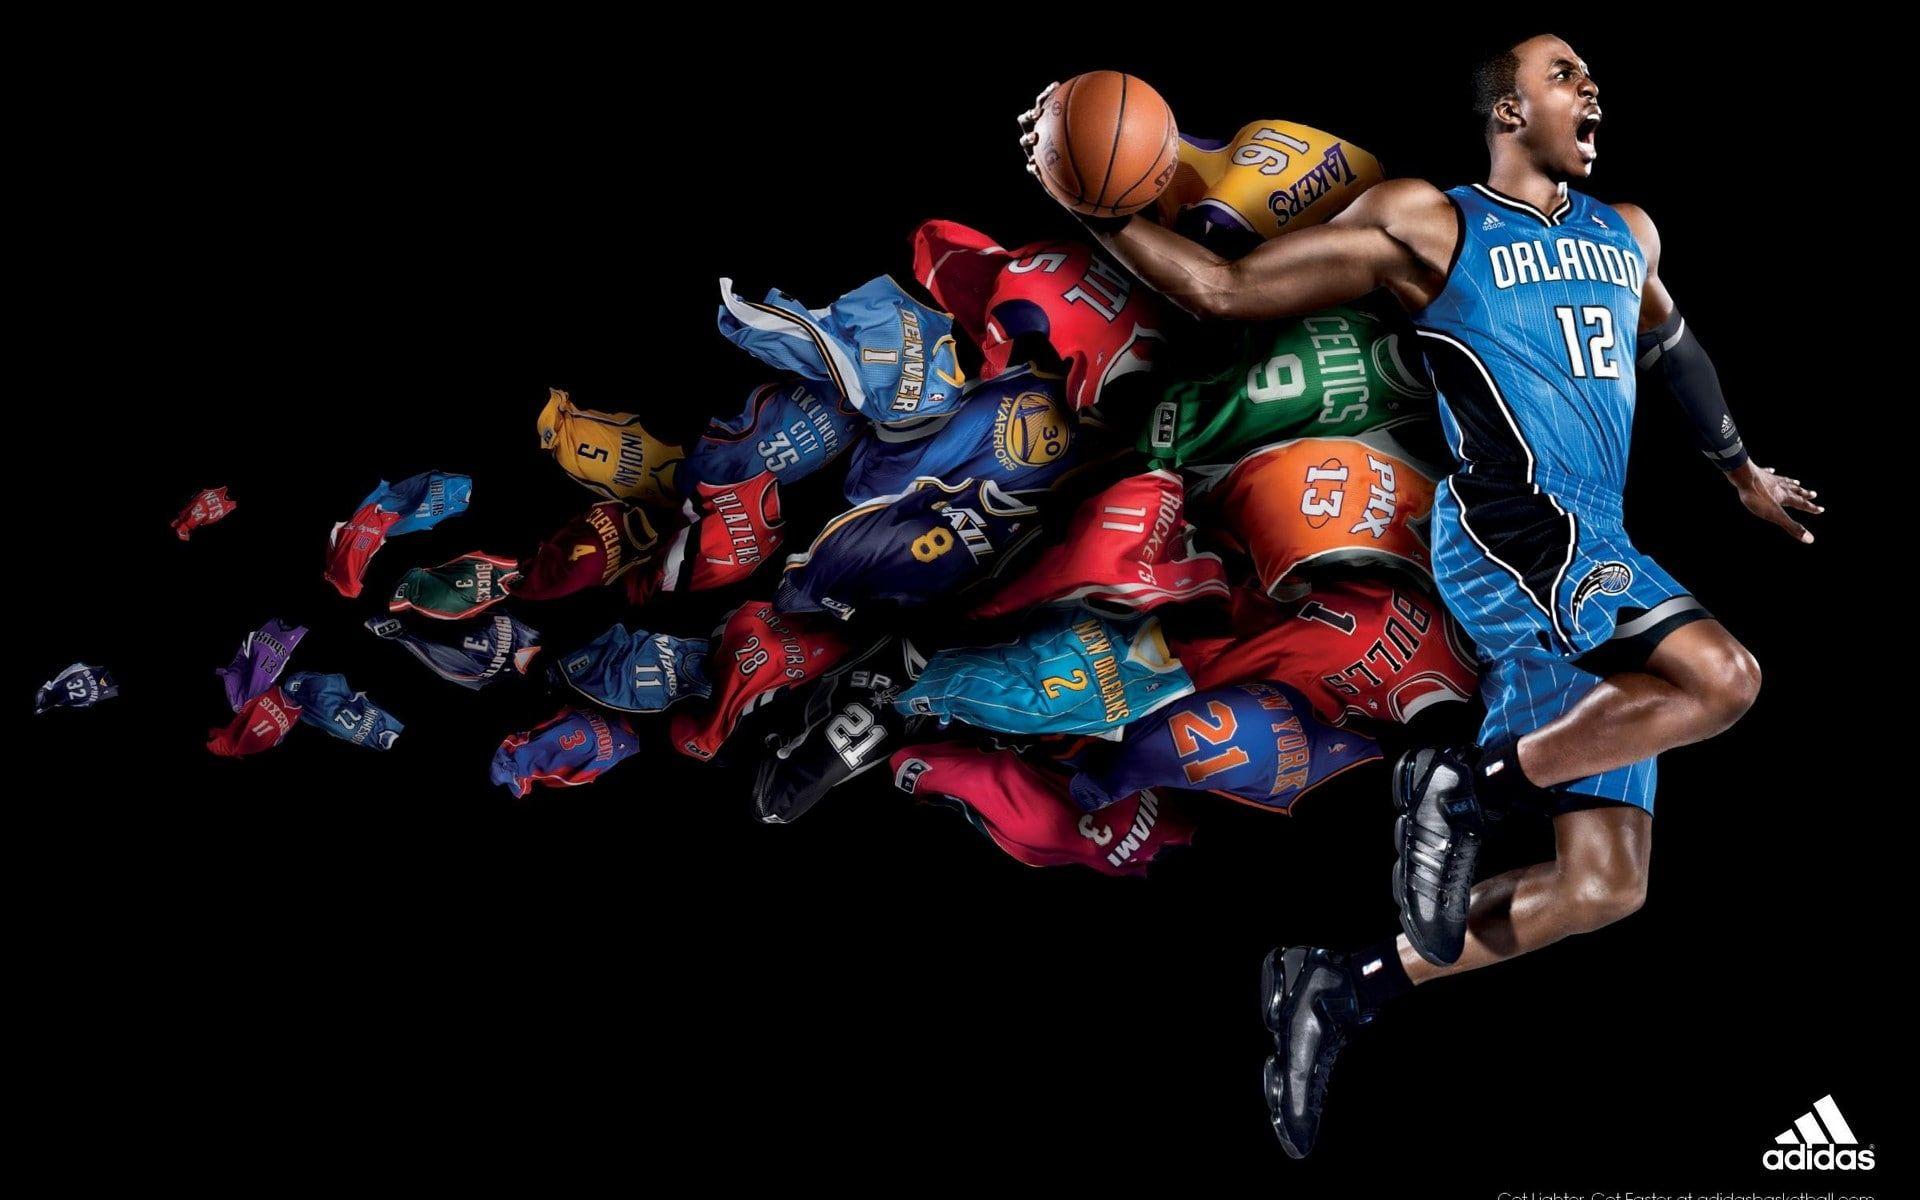 Basketball Dark Dwight Howard Nba Sports 1080p Wallpaper Hdwallpaper Desktop Basketball Wallpapers Hd Sports Wallpapers Basketball Wallpaper